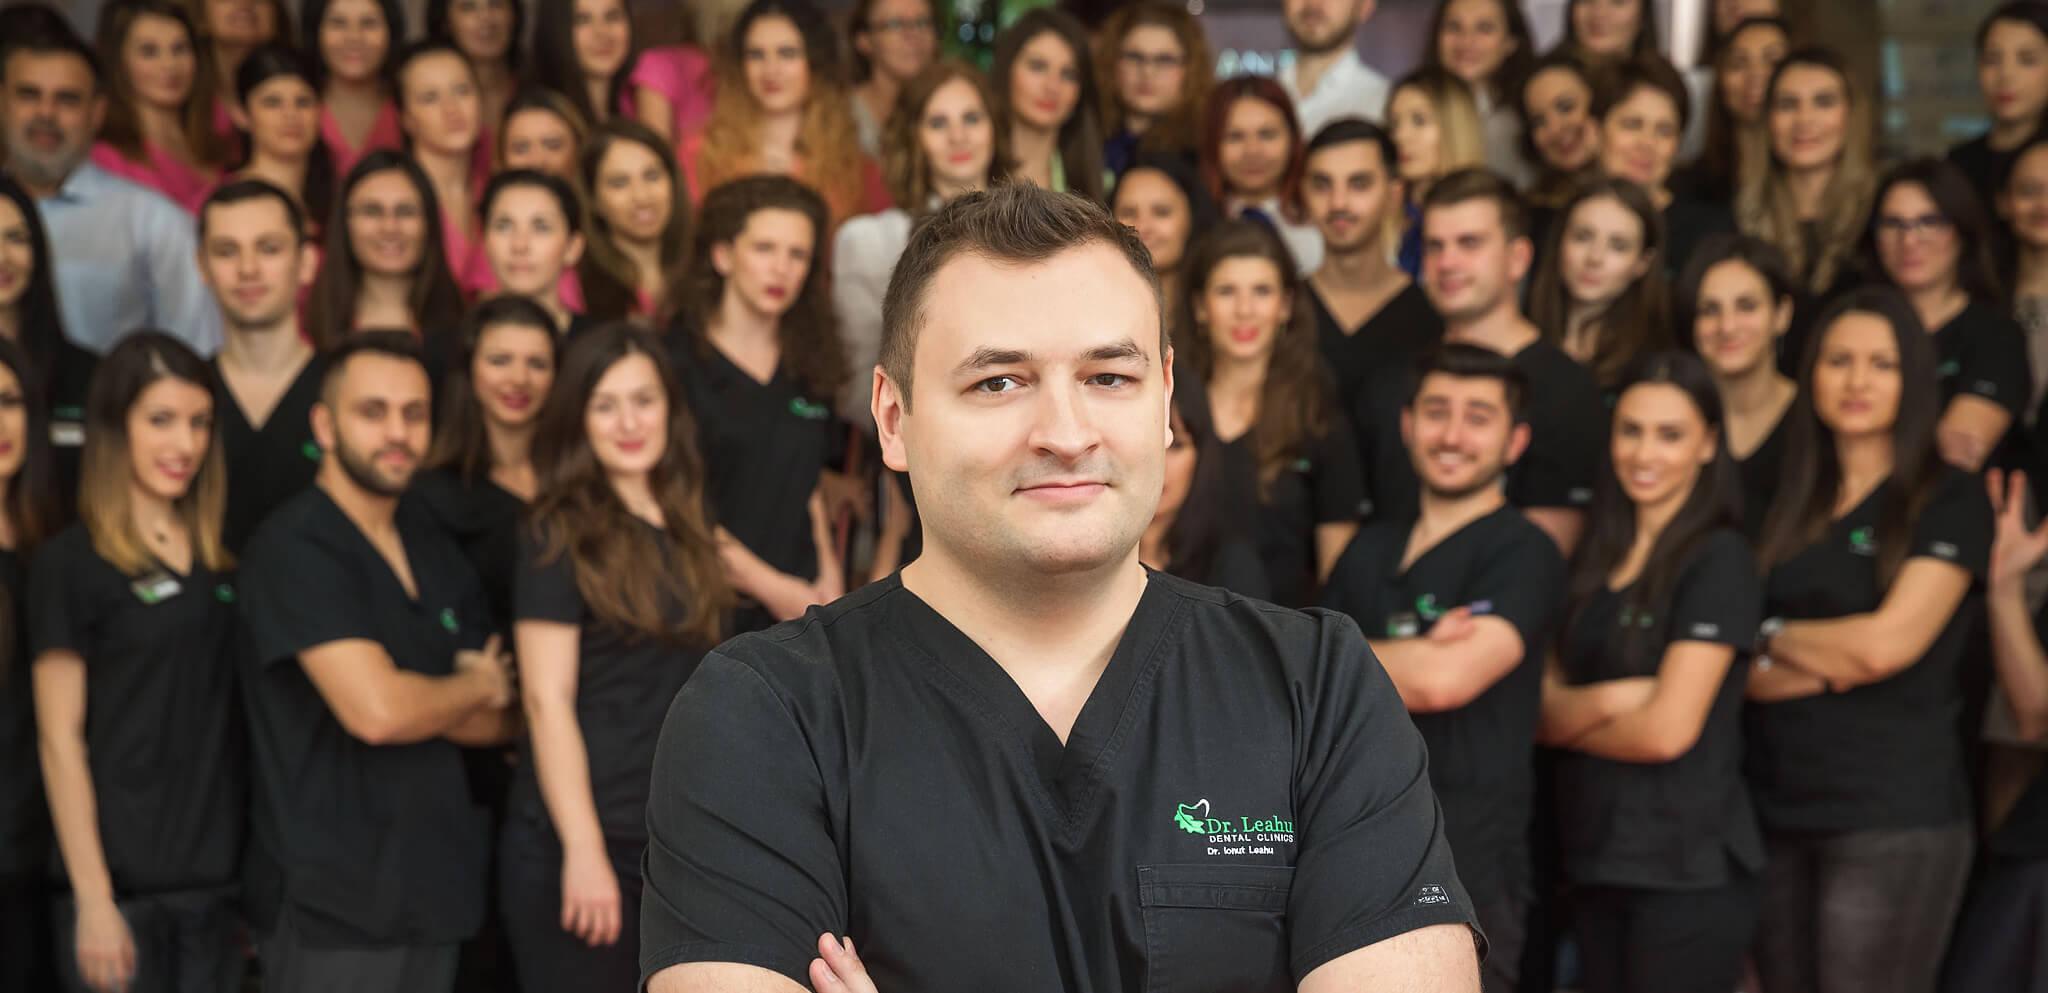 Dr. Ionut Leahu si echipa de medici stomatologi din cadrul clinicilor stomatologice Dr. Leahu